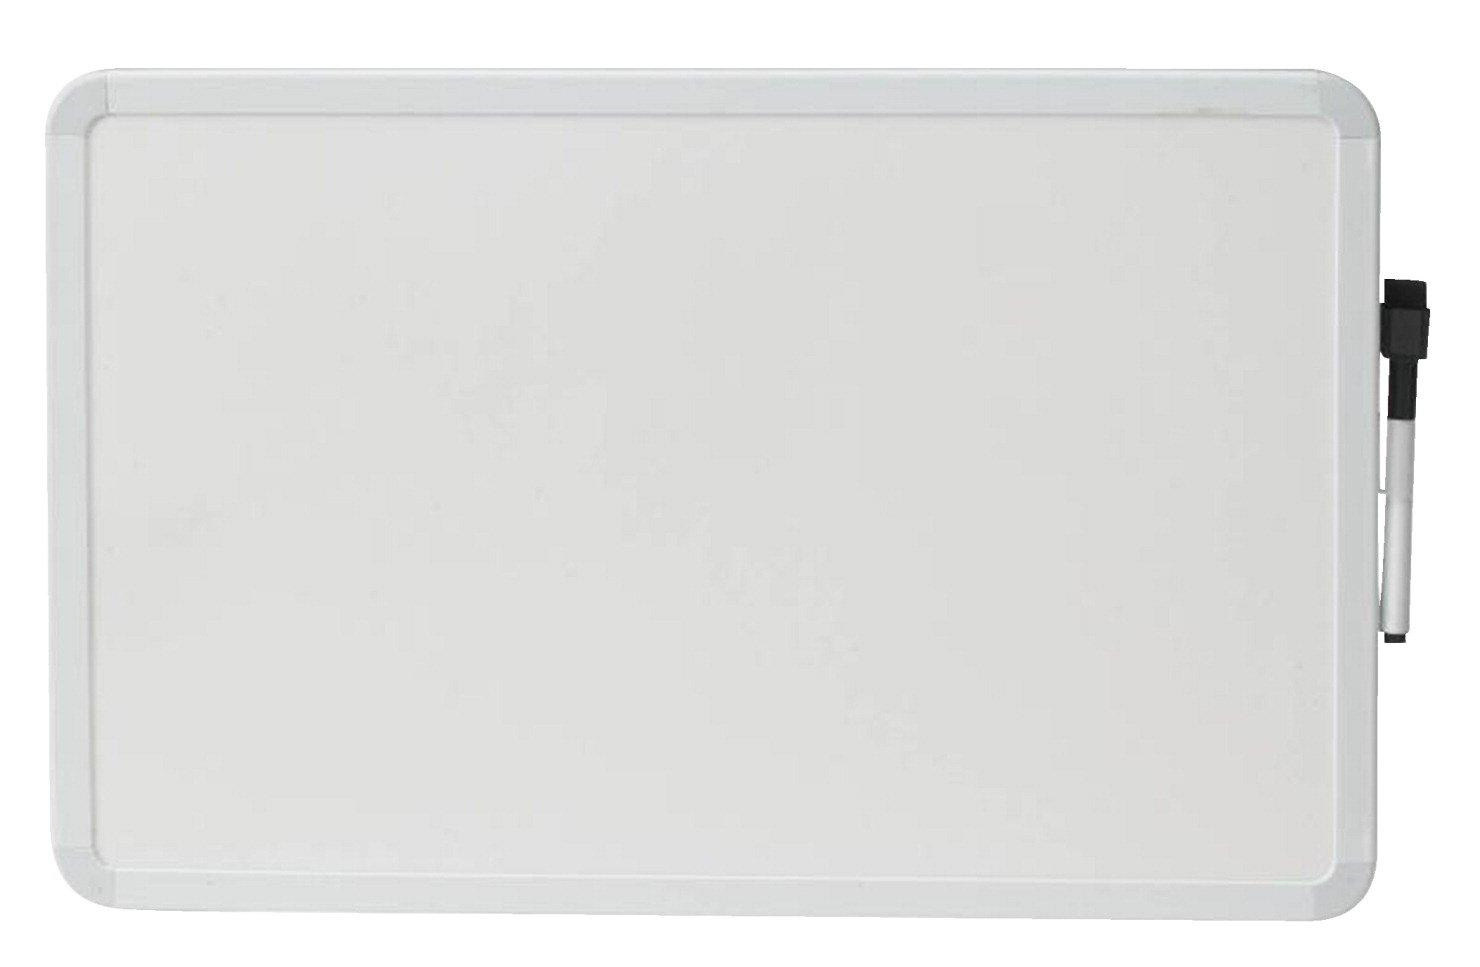 School Smart 633747 Dry Erase Boards - 11 x 17 inches - White